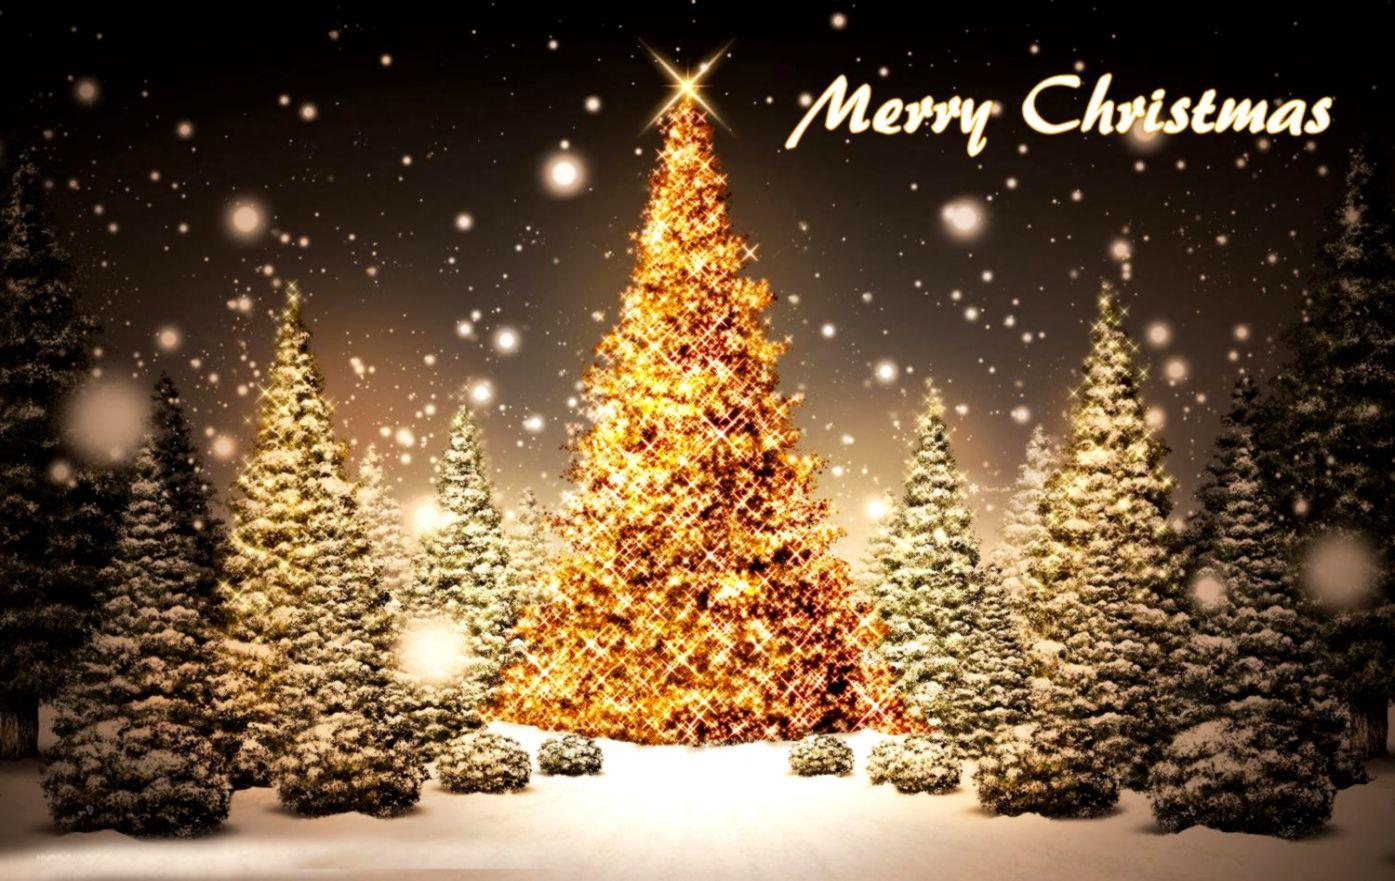 Beautiful Merry Christmas Tree Cute Christmas Wallpapers